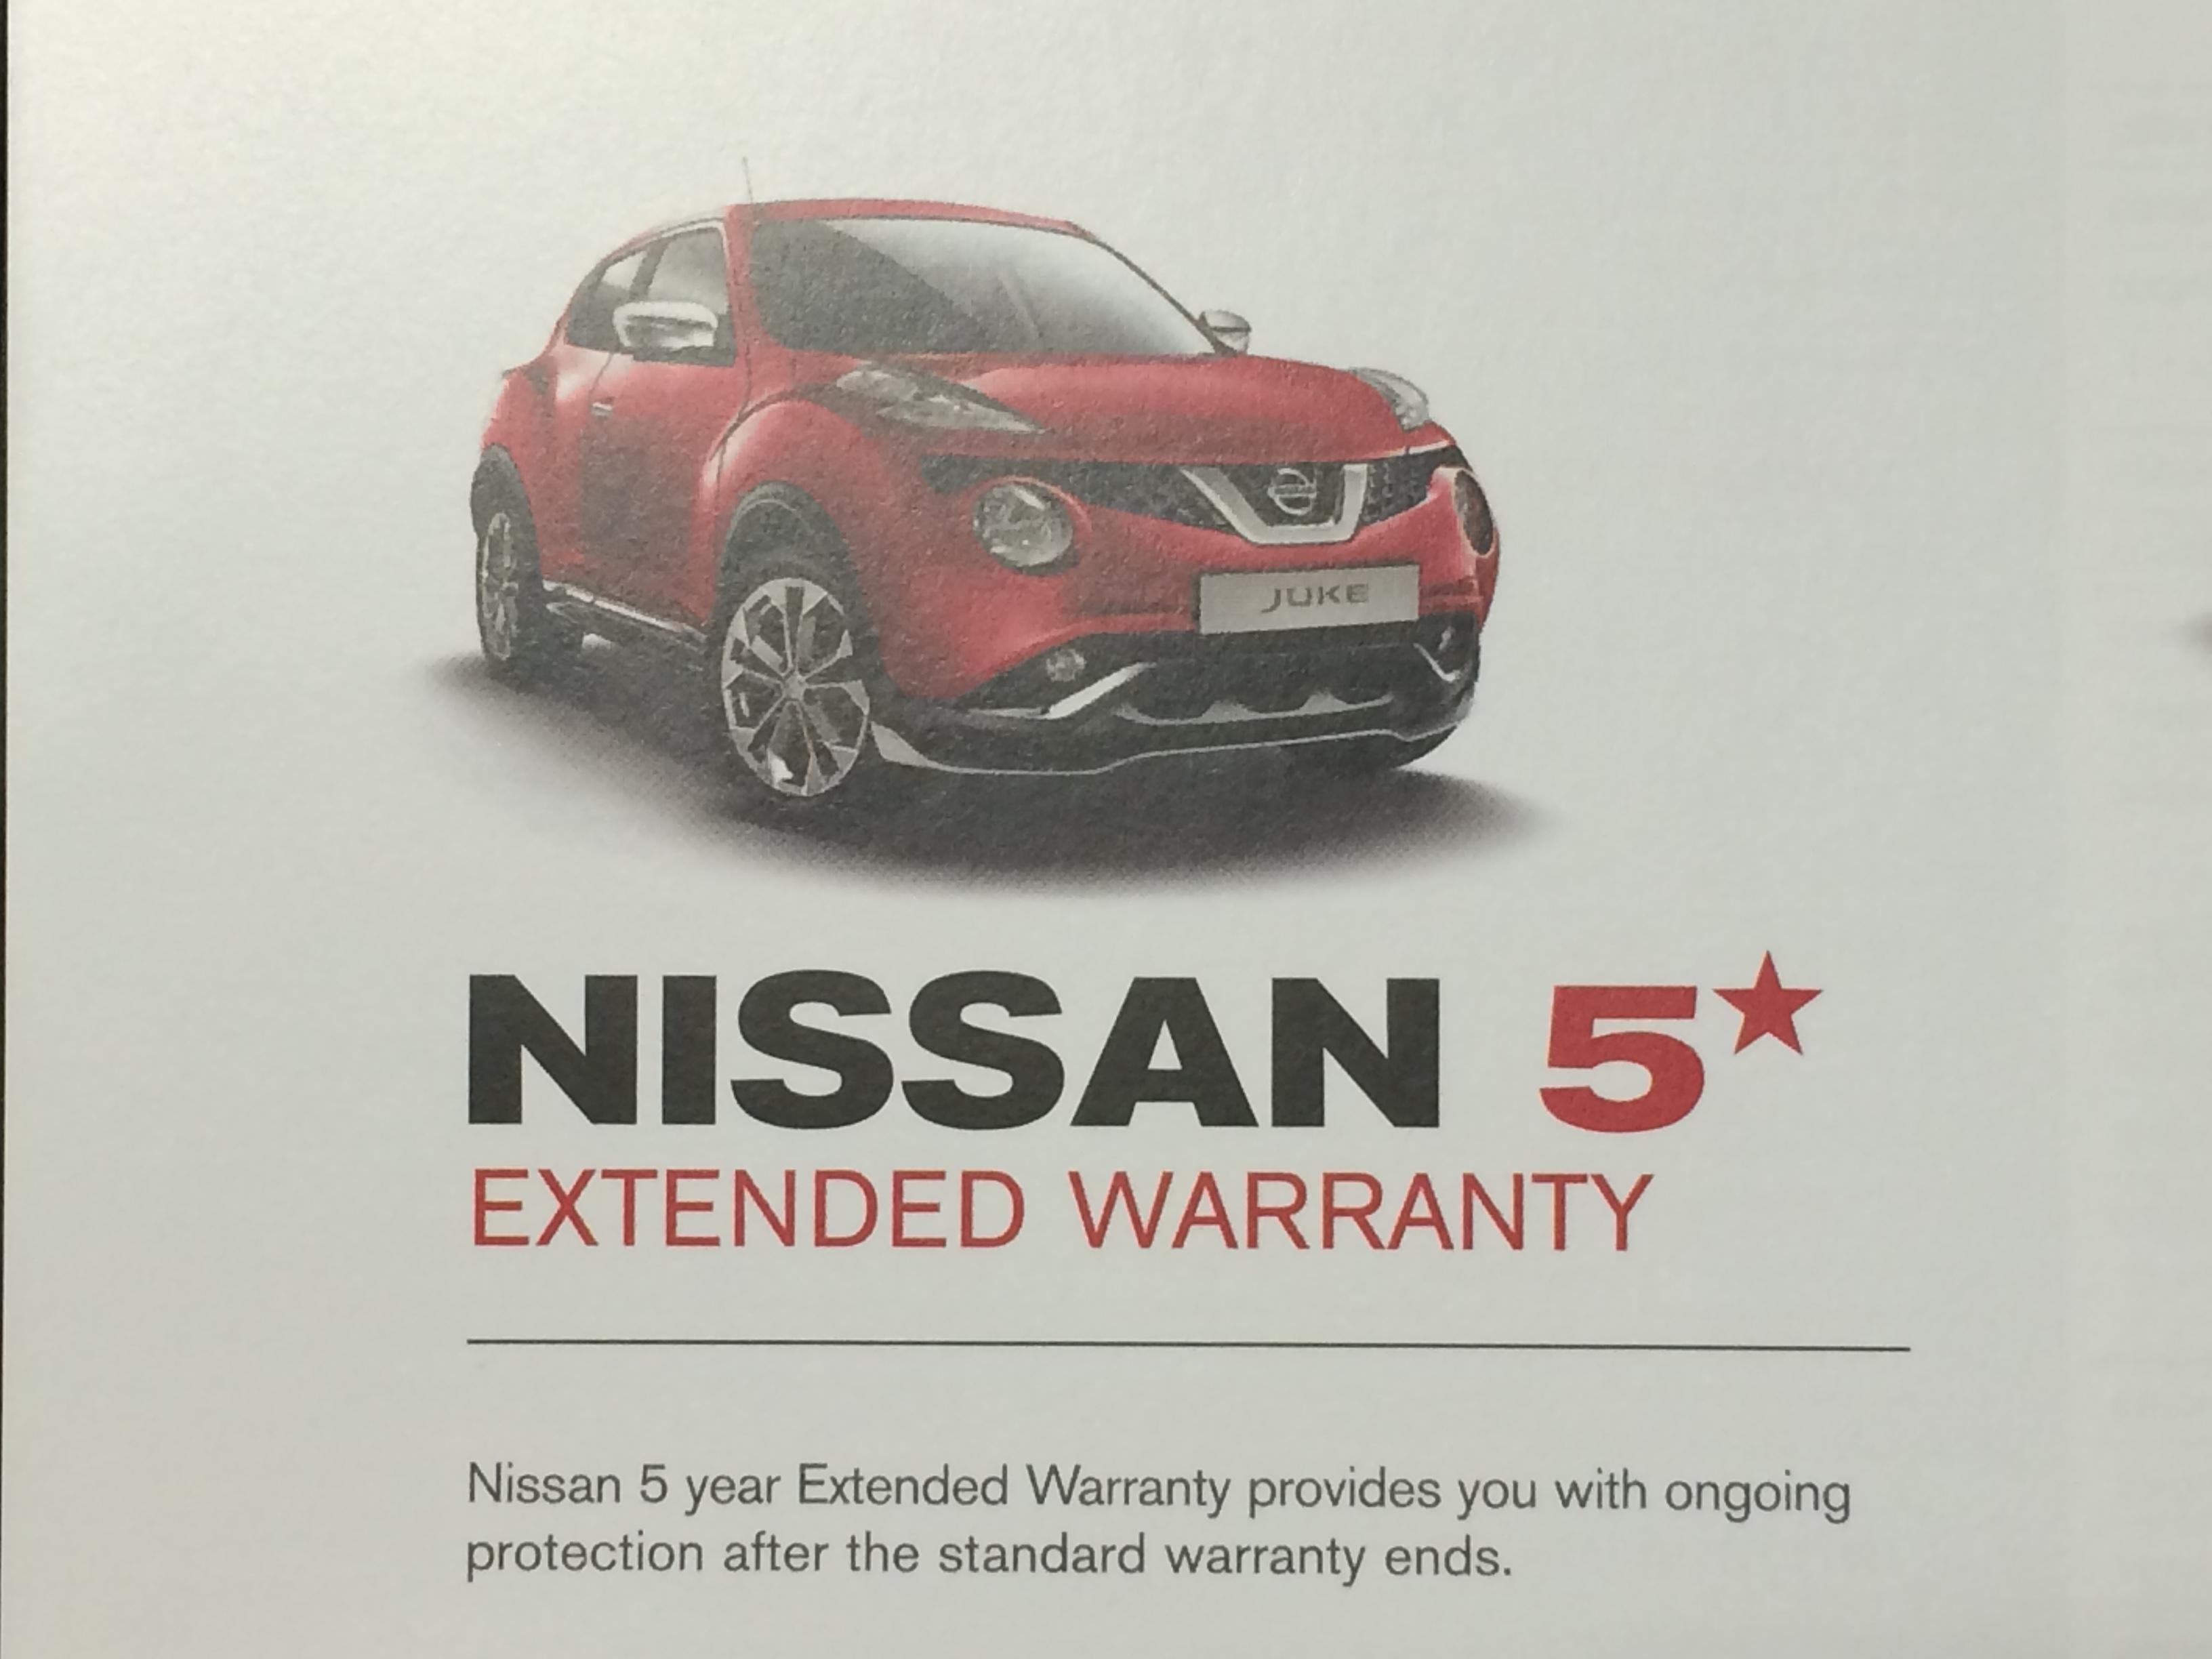 usa smart sl tools grade sentra aspenwhite a build ximg full l nissan shopping price warranty extended m